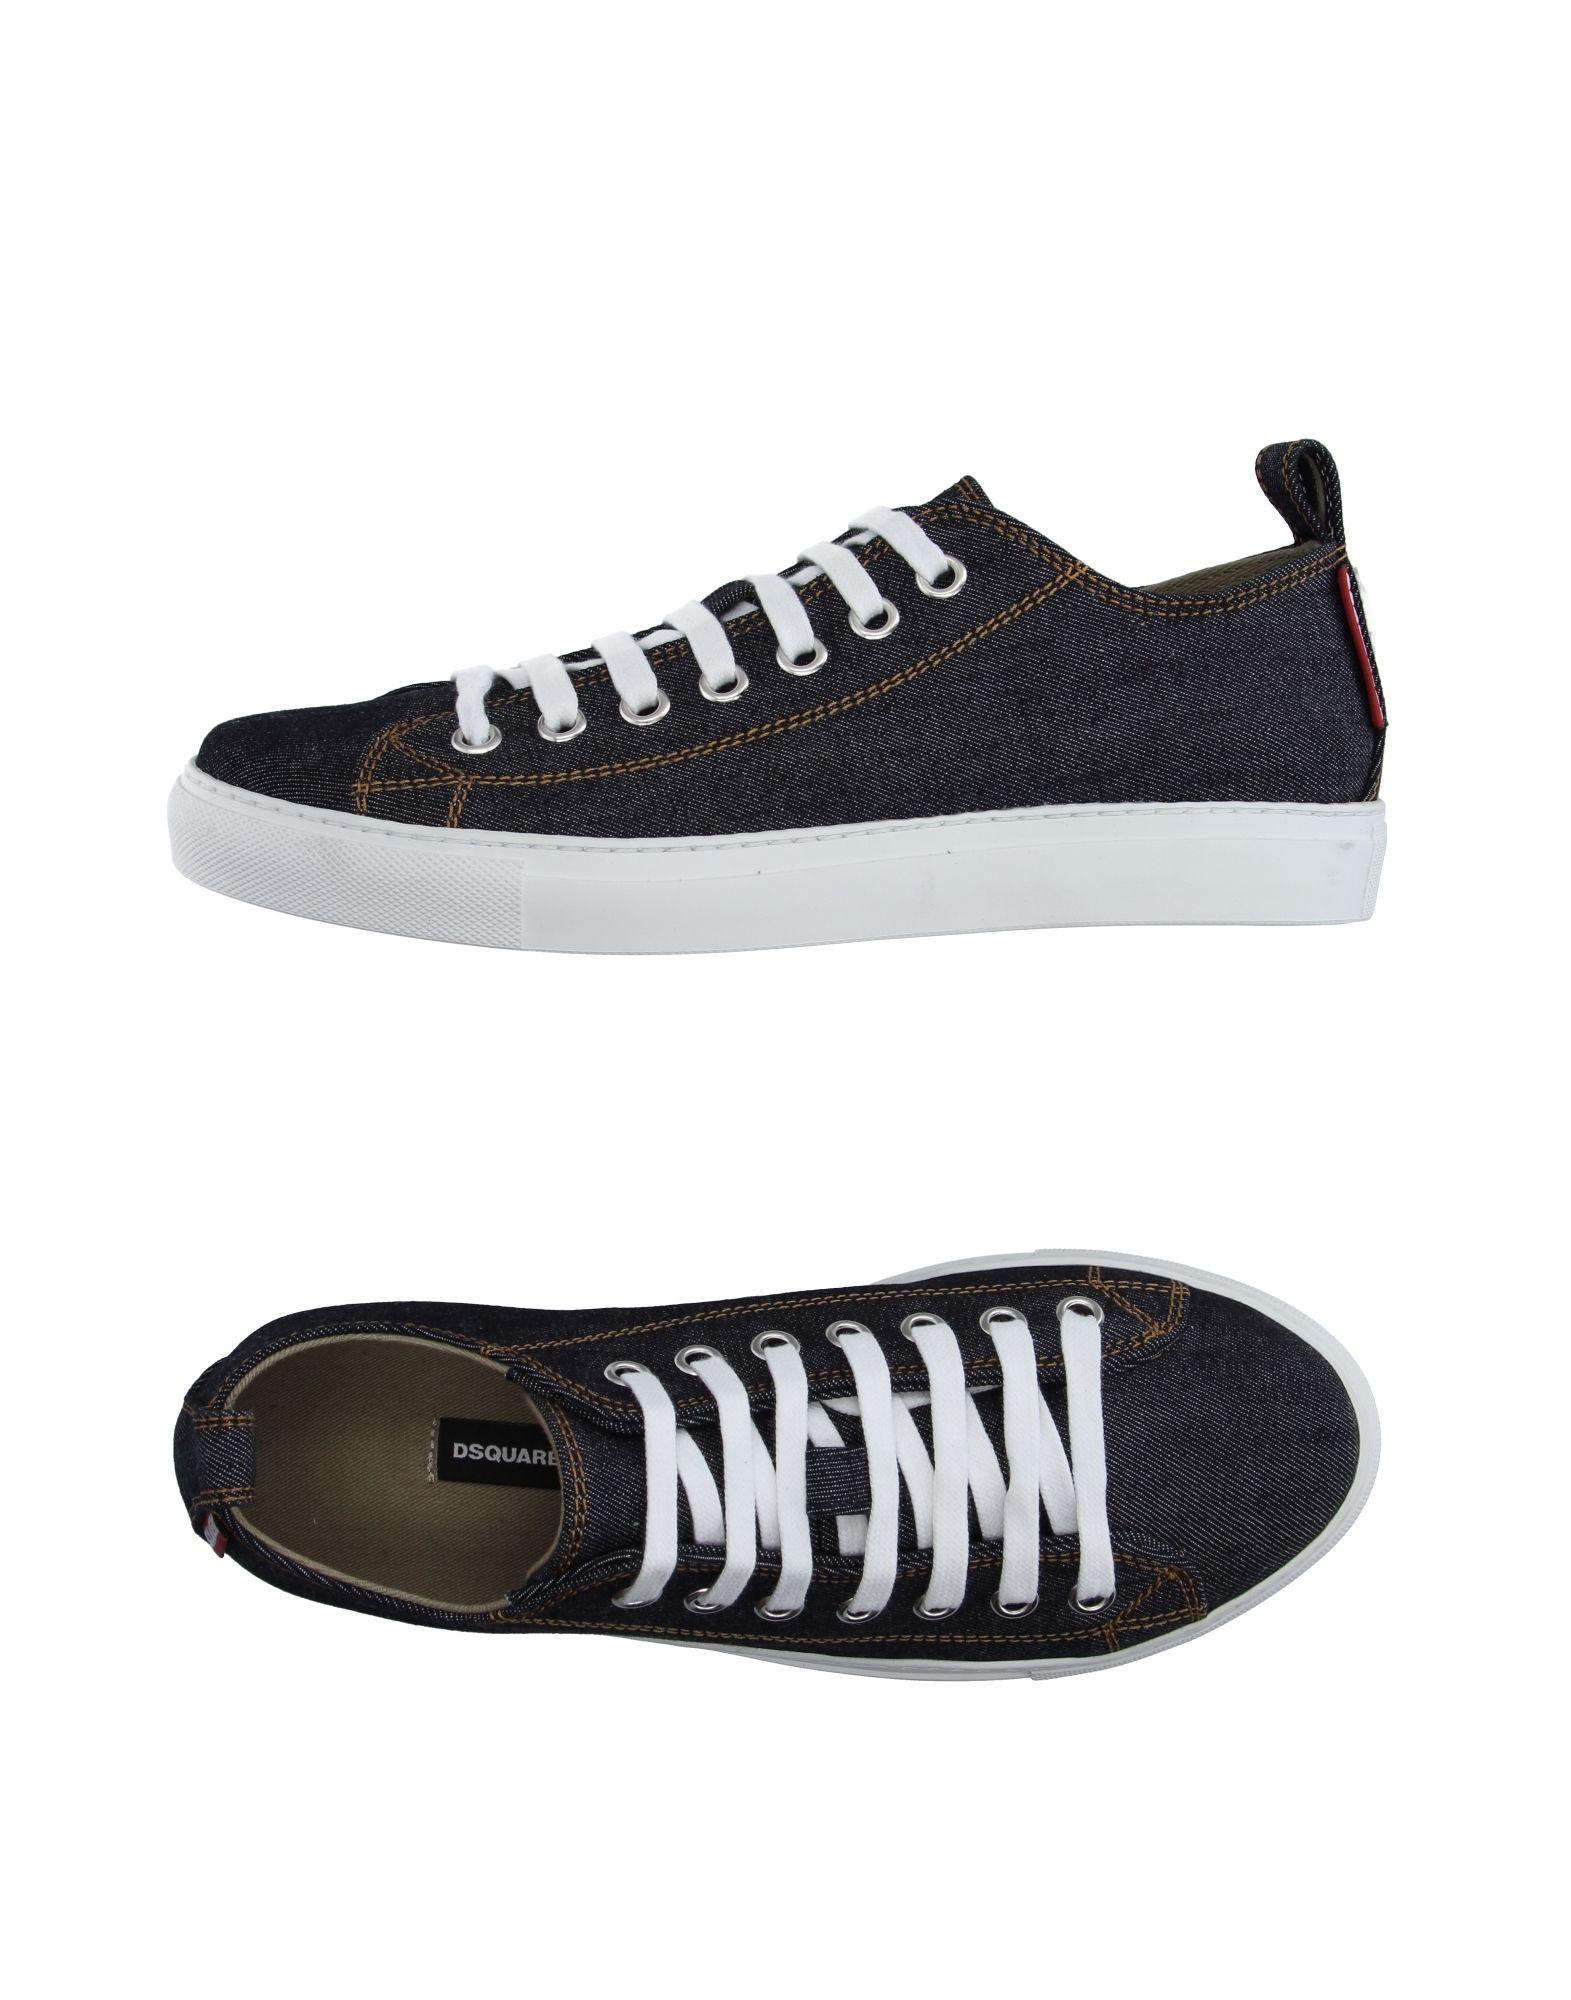 Dsquared2 Sneakers Herren  Schuhe 11121493OI Gute Qualität beliebte Schuhe  f0aed8